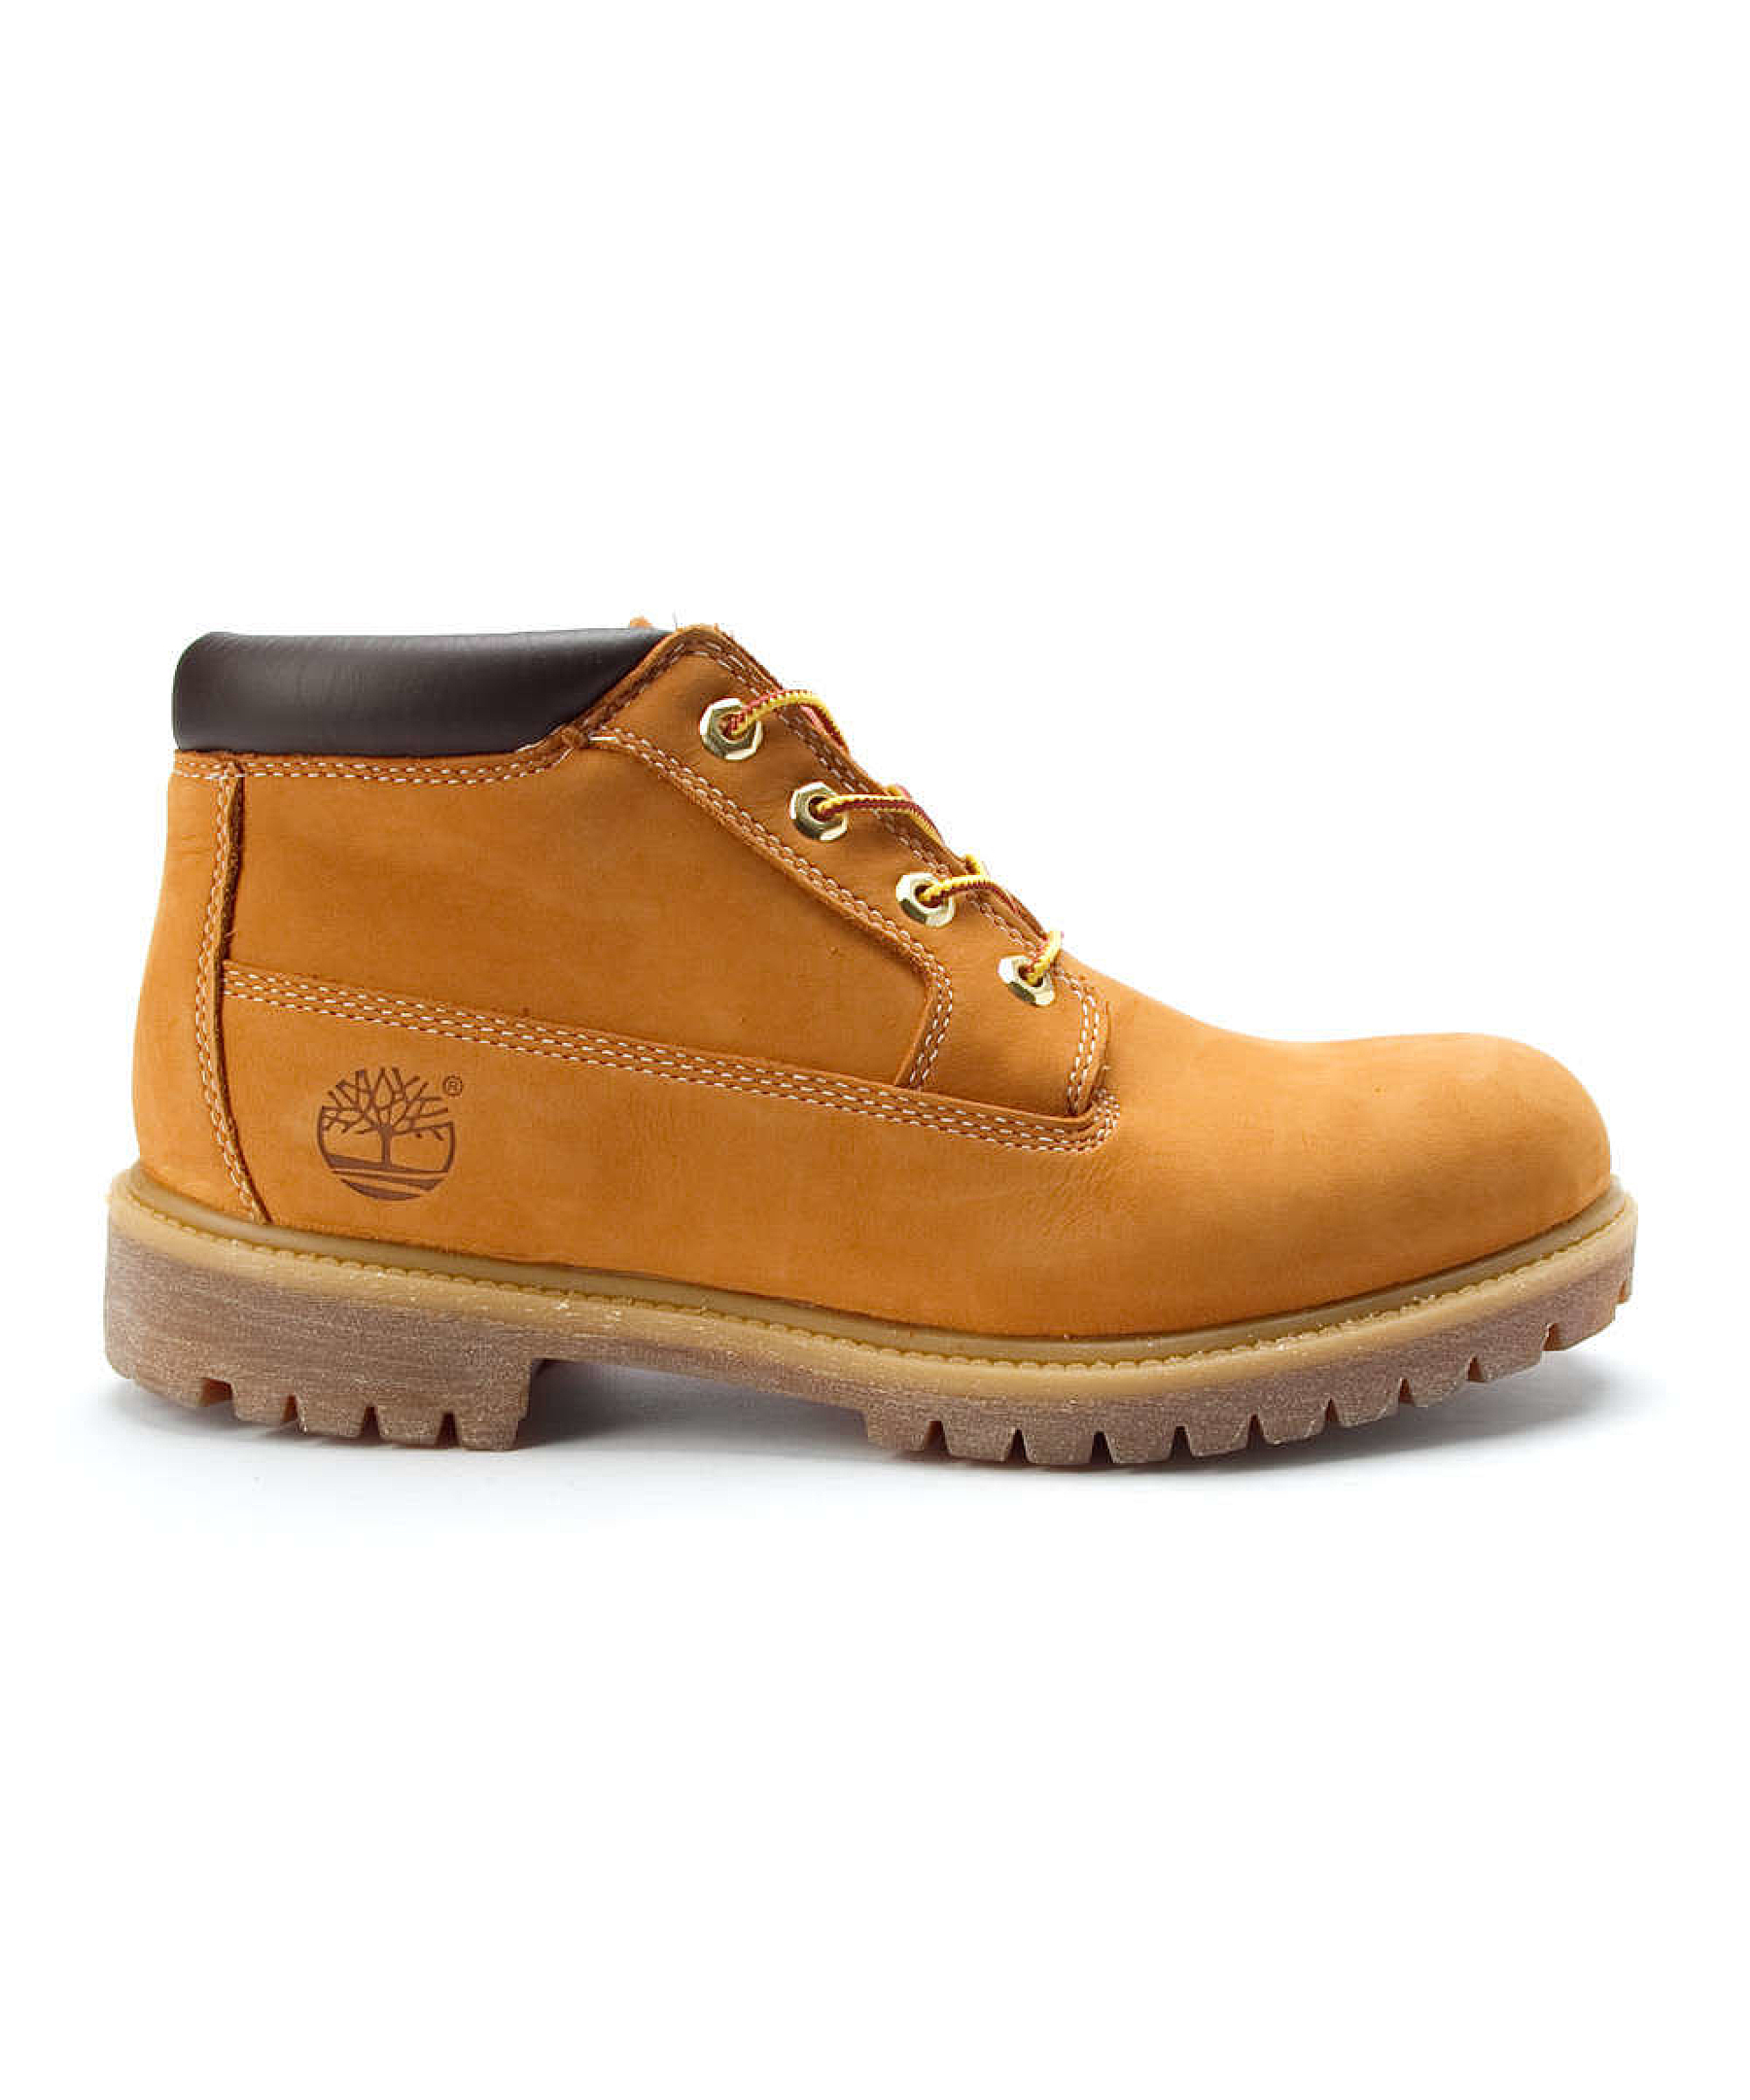 timberland mens premium waterproof chukka boots in beige